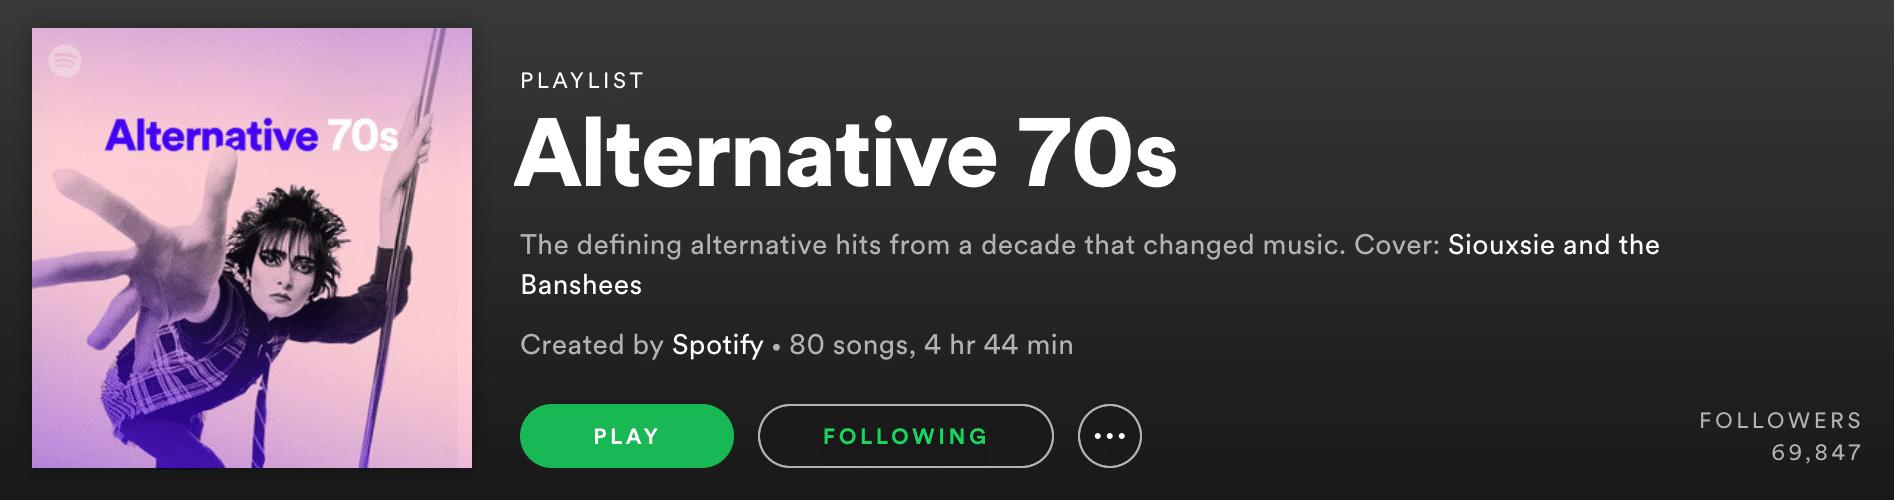 alternative70s